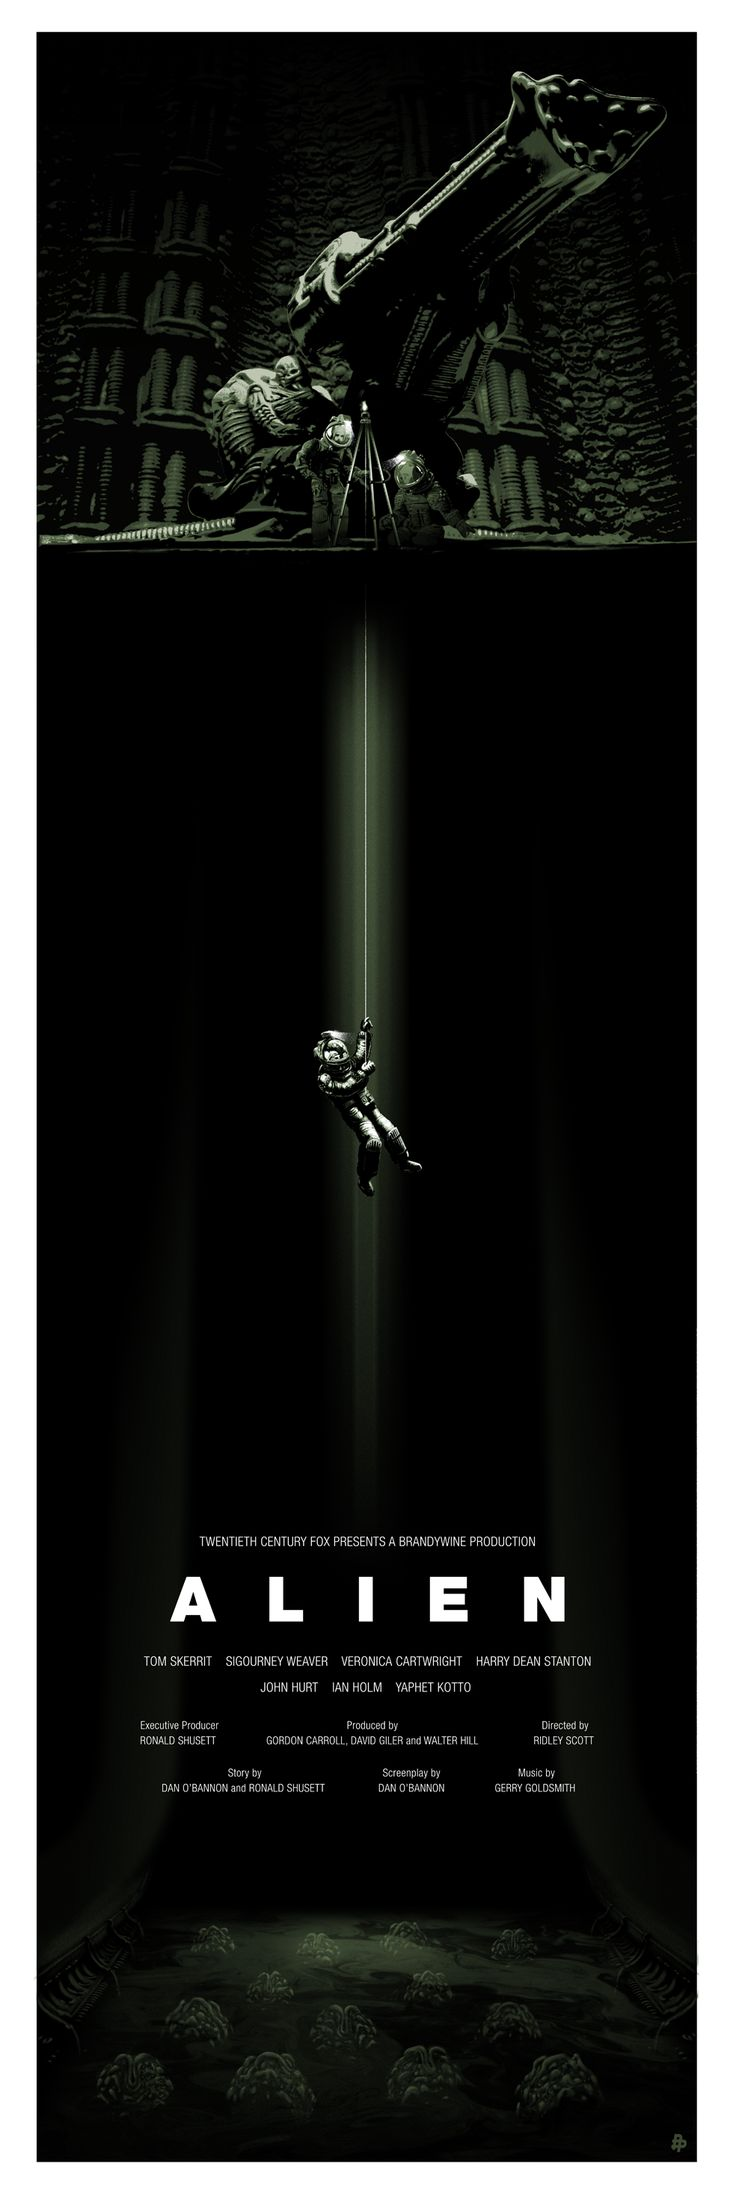 Alien Movie Poster | #movies #poster #alien